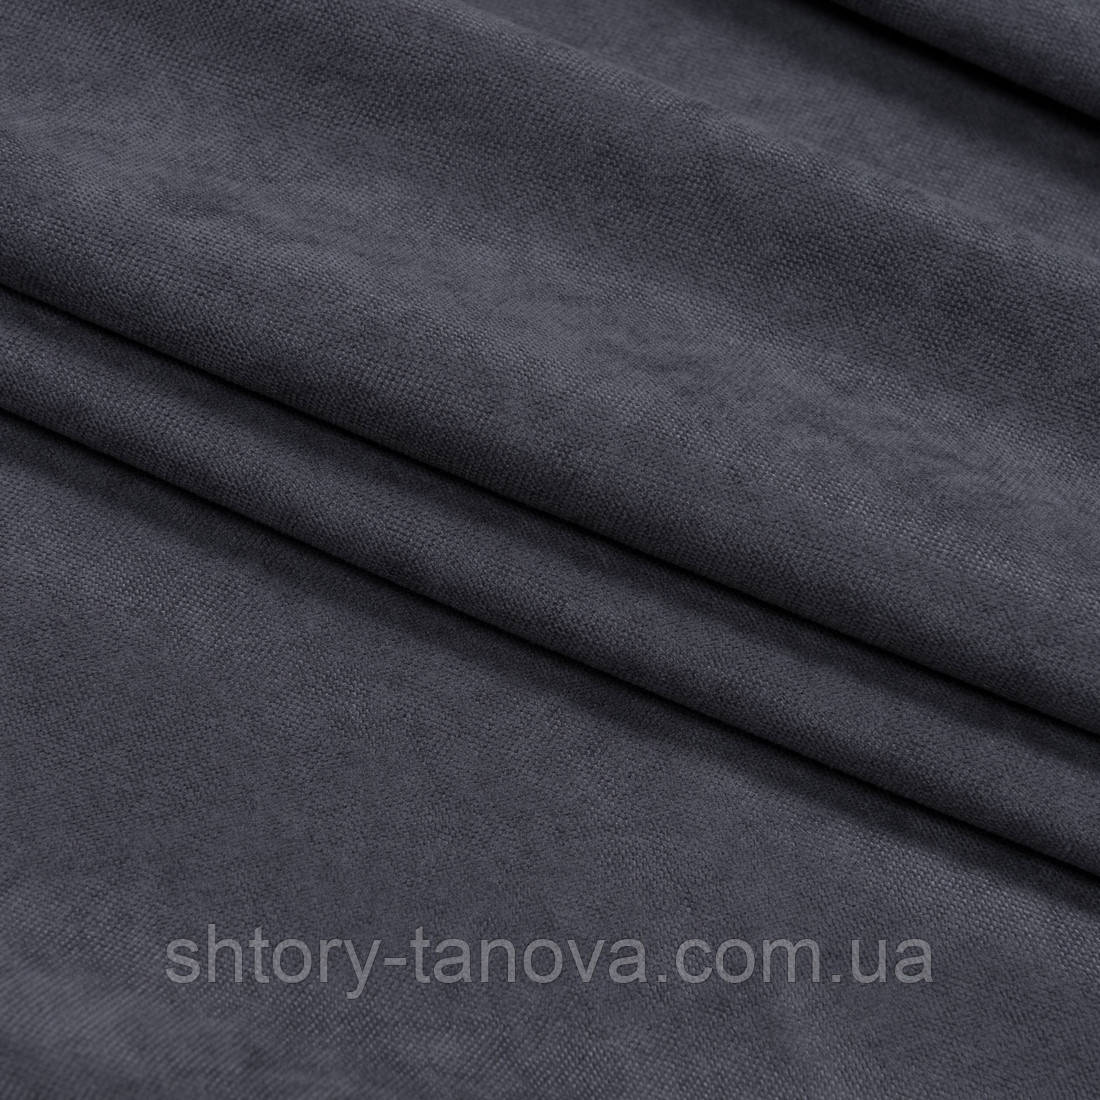 Нубук тканина для штор графіт